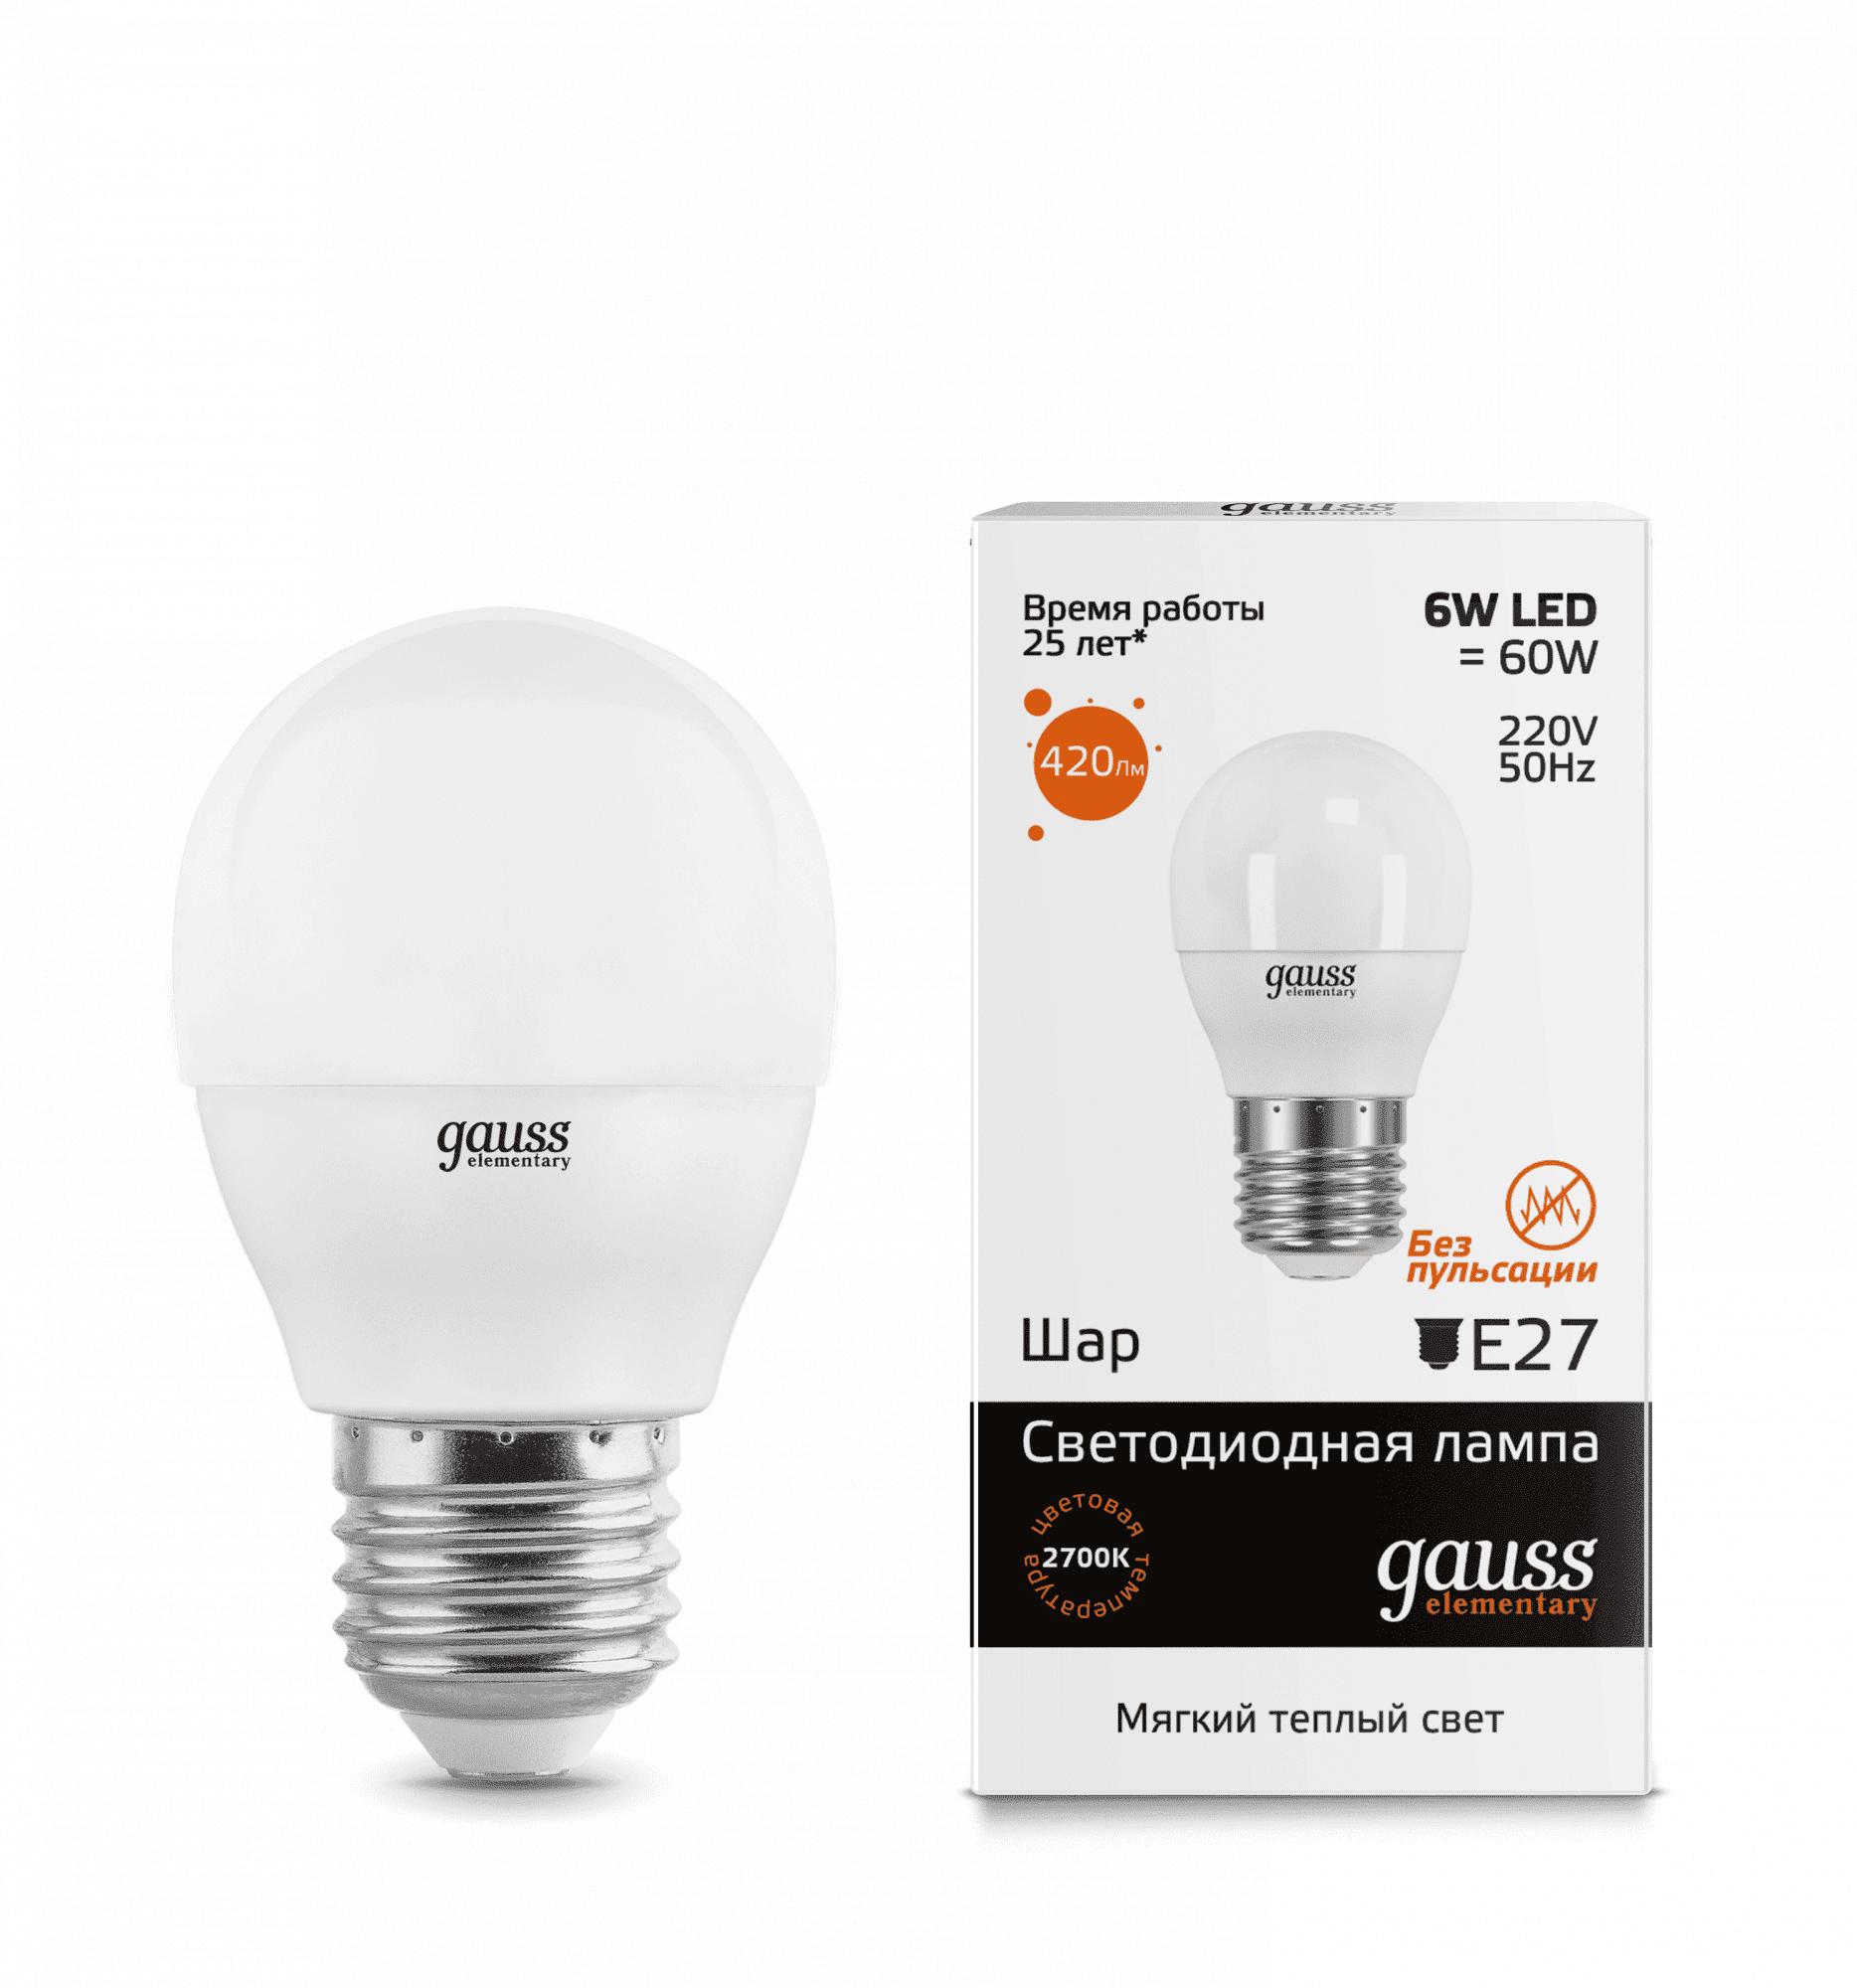 Gauss LED Elementary Globe 6W E27 2700K 1/10/50 арт. 53216